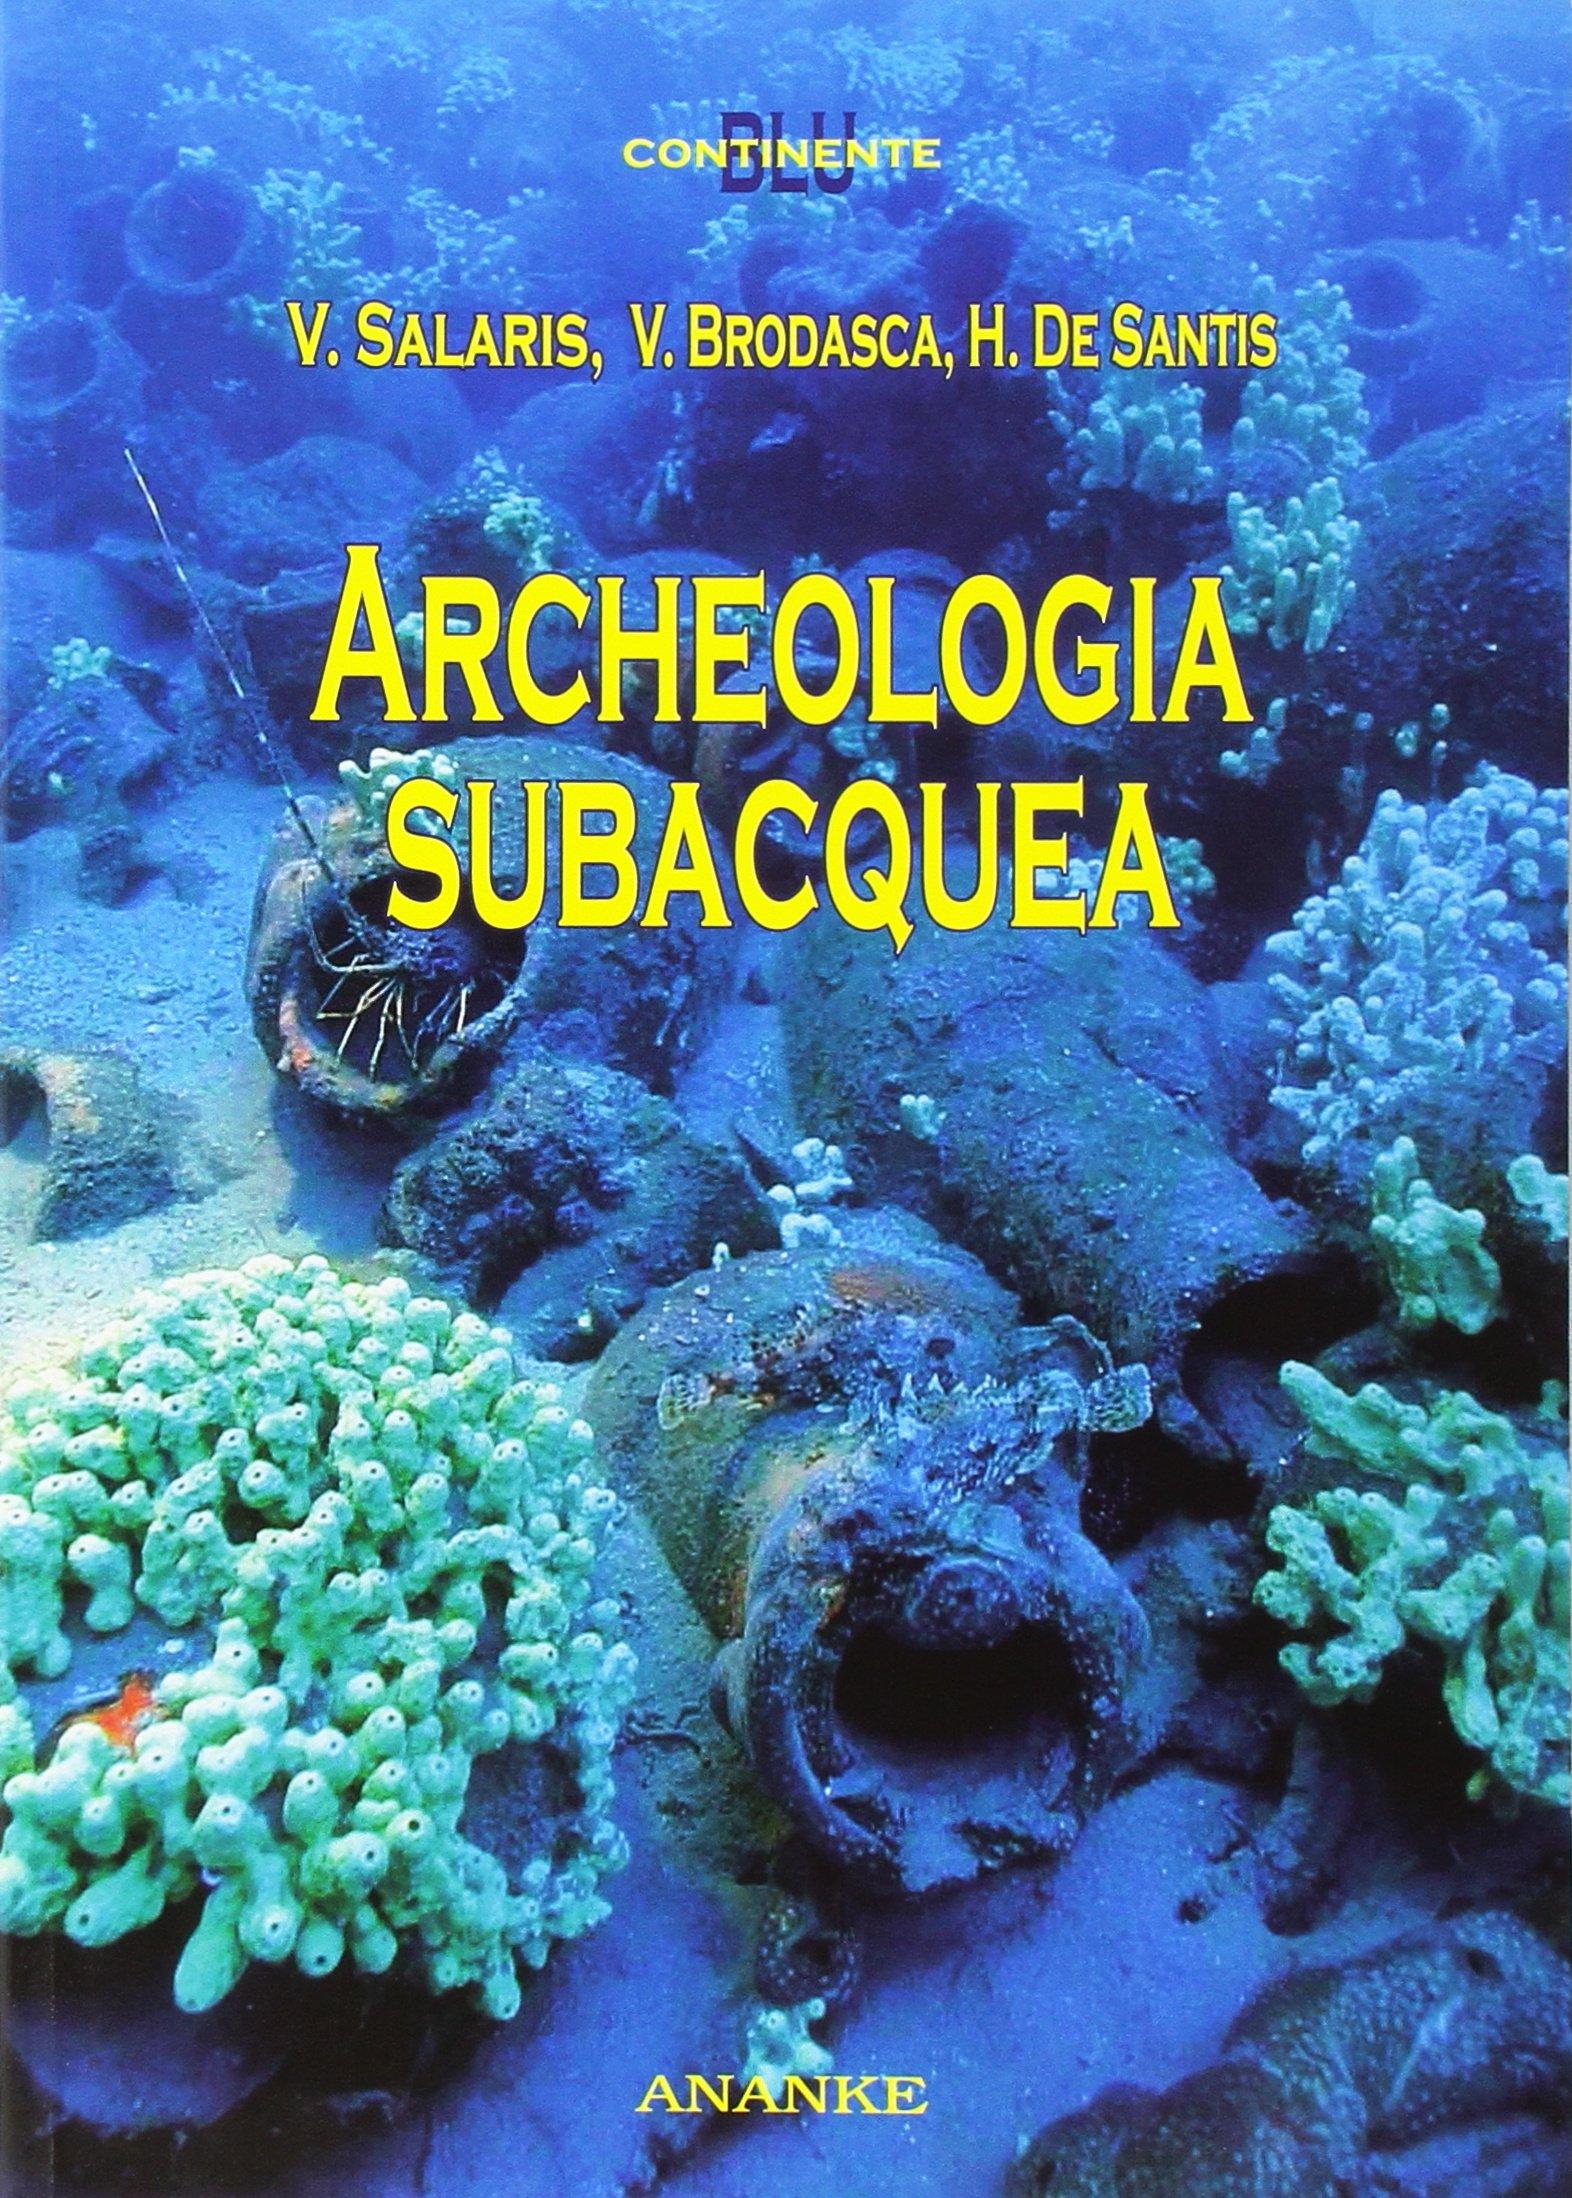 Archeologia subacquea Copertina flessibile – 1 gen 2016 Valeria Salaris Valentina Brodasca Henry De Santis Kemet